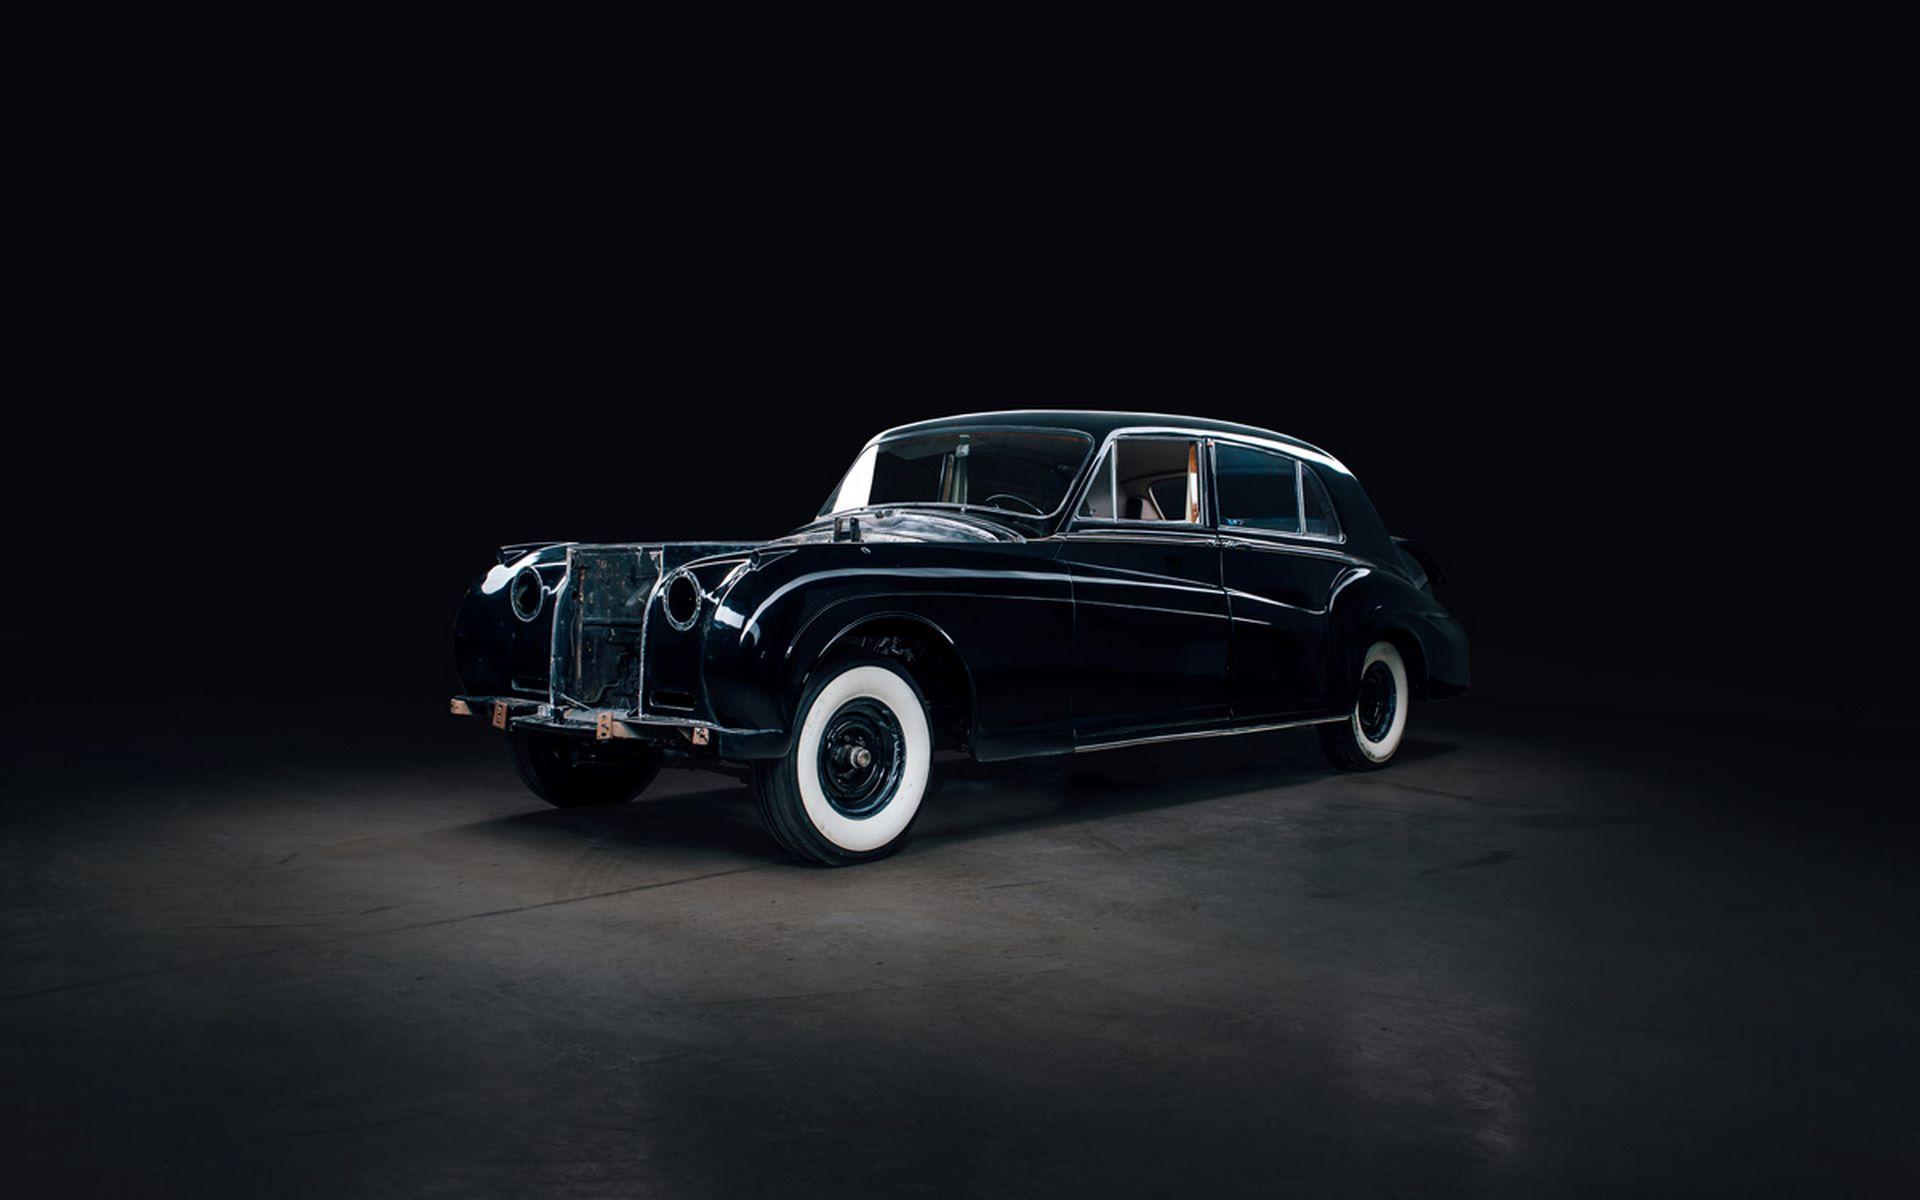 Electris-Rolls-Royce-Phantom-V-and-Silver-Cloud-by-Lunaz-21